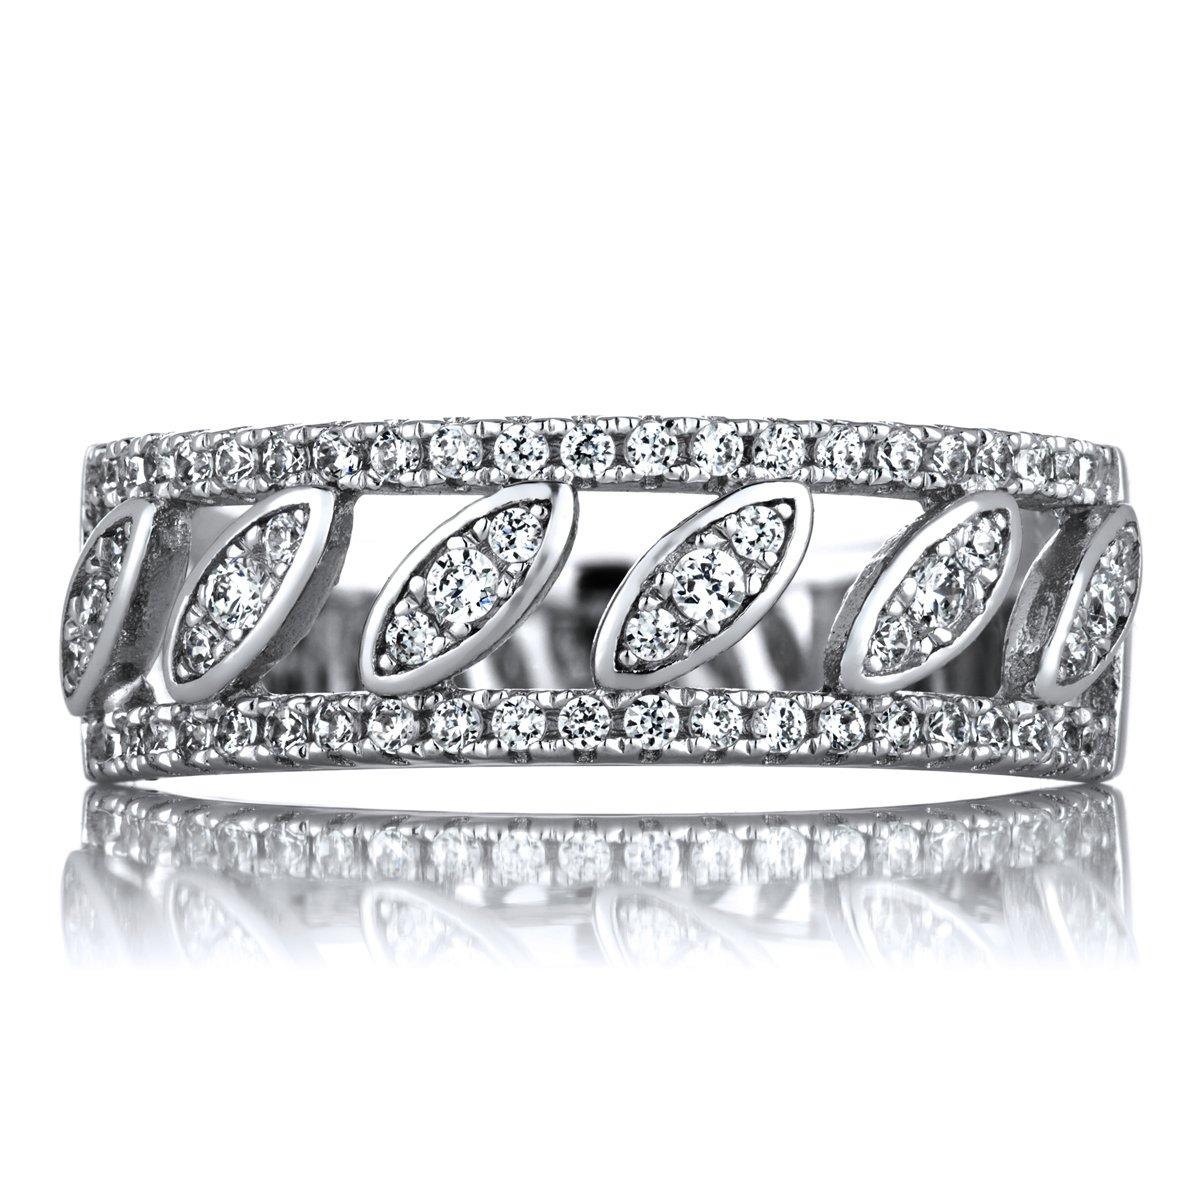 Patrice's 7mm CZ Art Deco Style Anniversary Ring